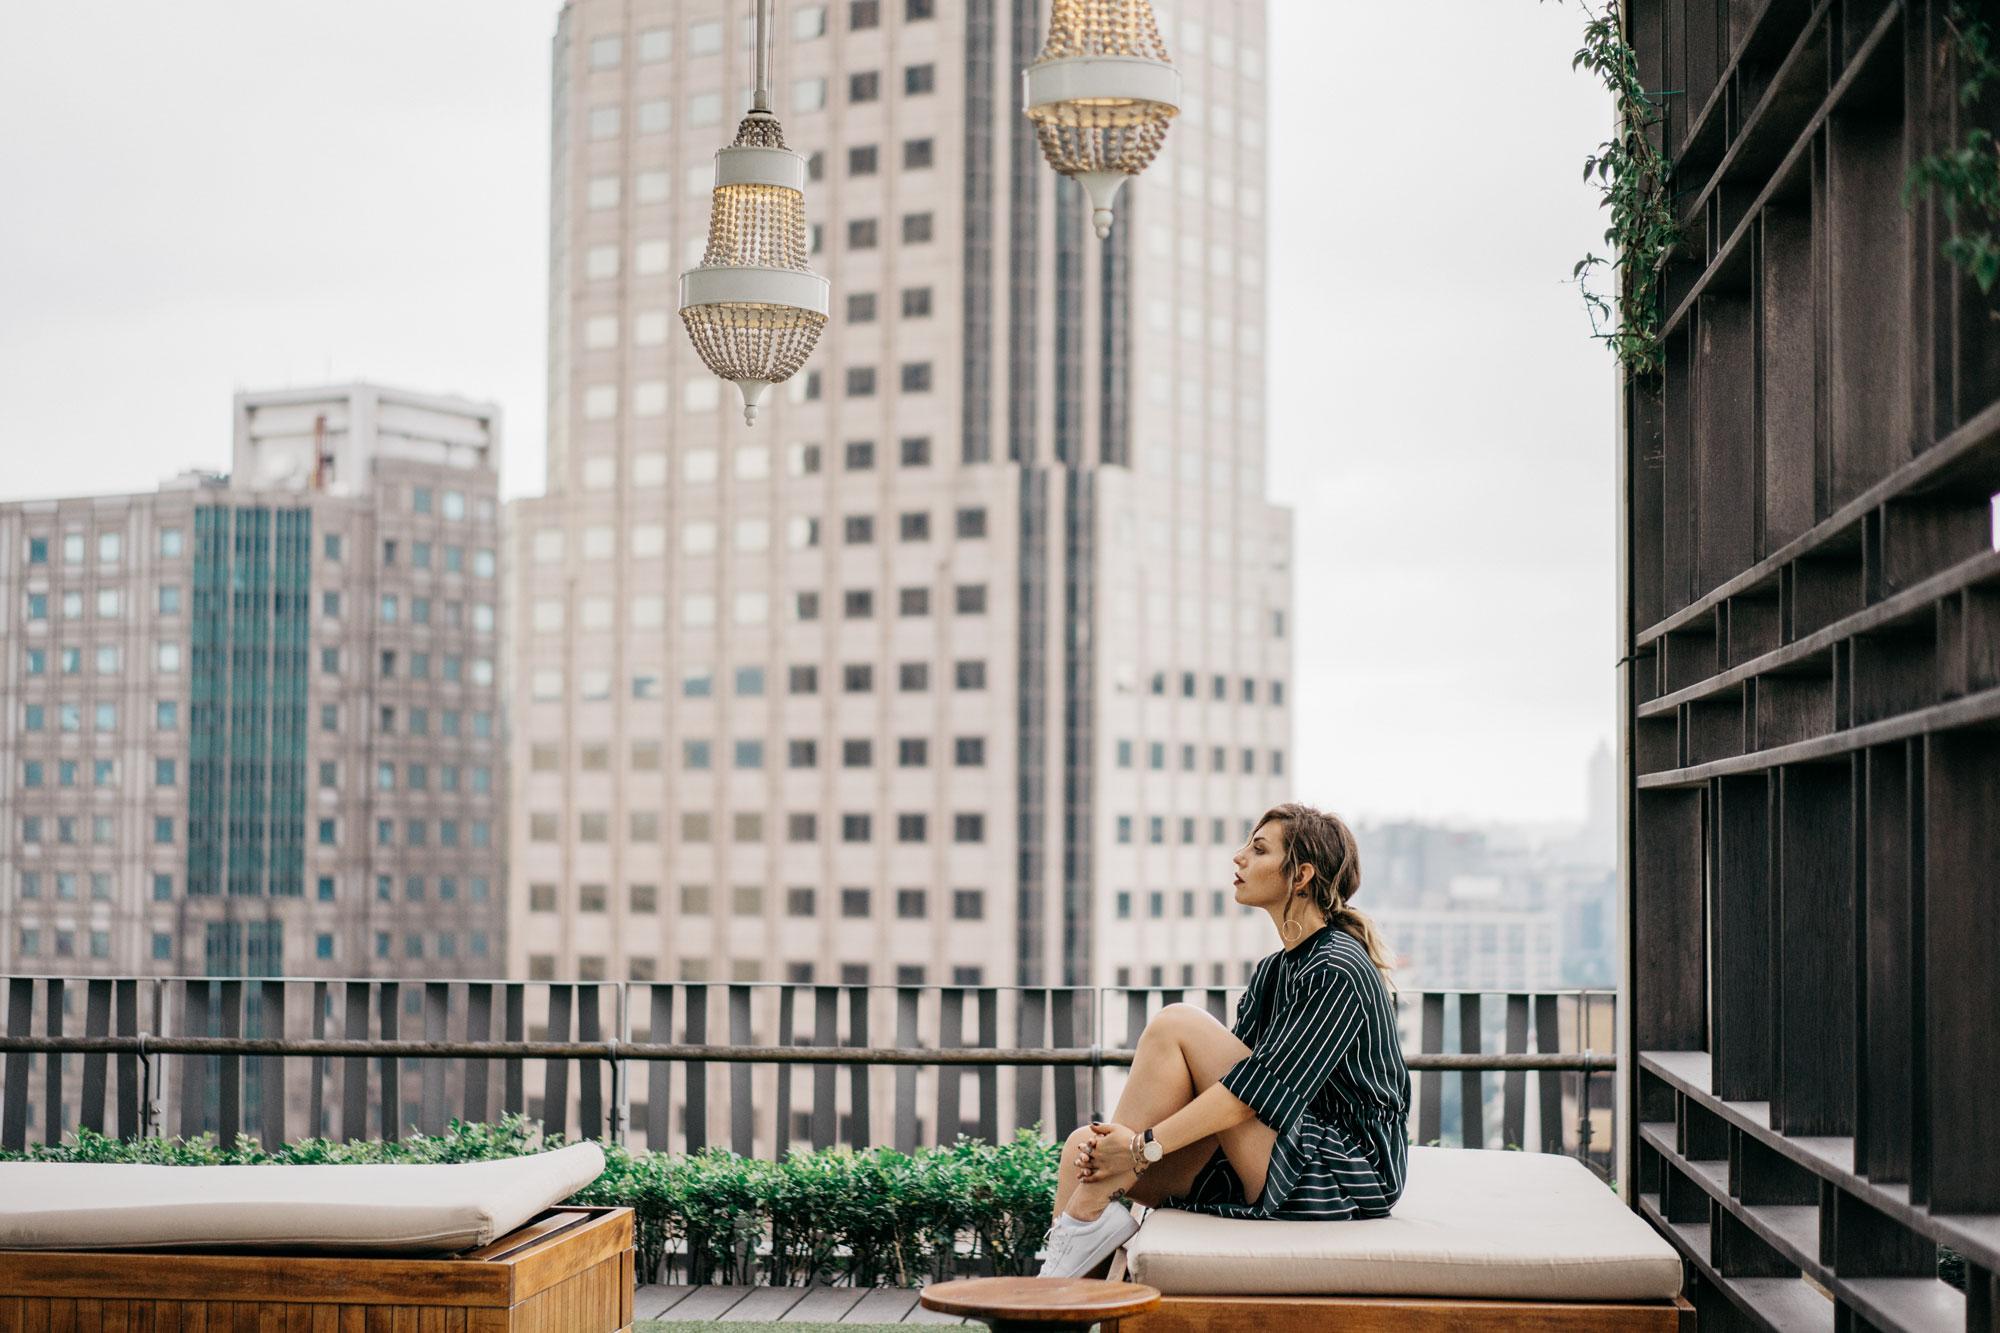 Hotel Review, W Taipei, Taiwan, Masha Sedgwick, Blogger, Germany, Berlin, Where to sleep in Taiwan